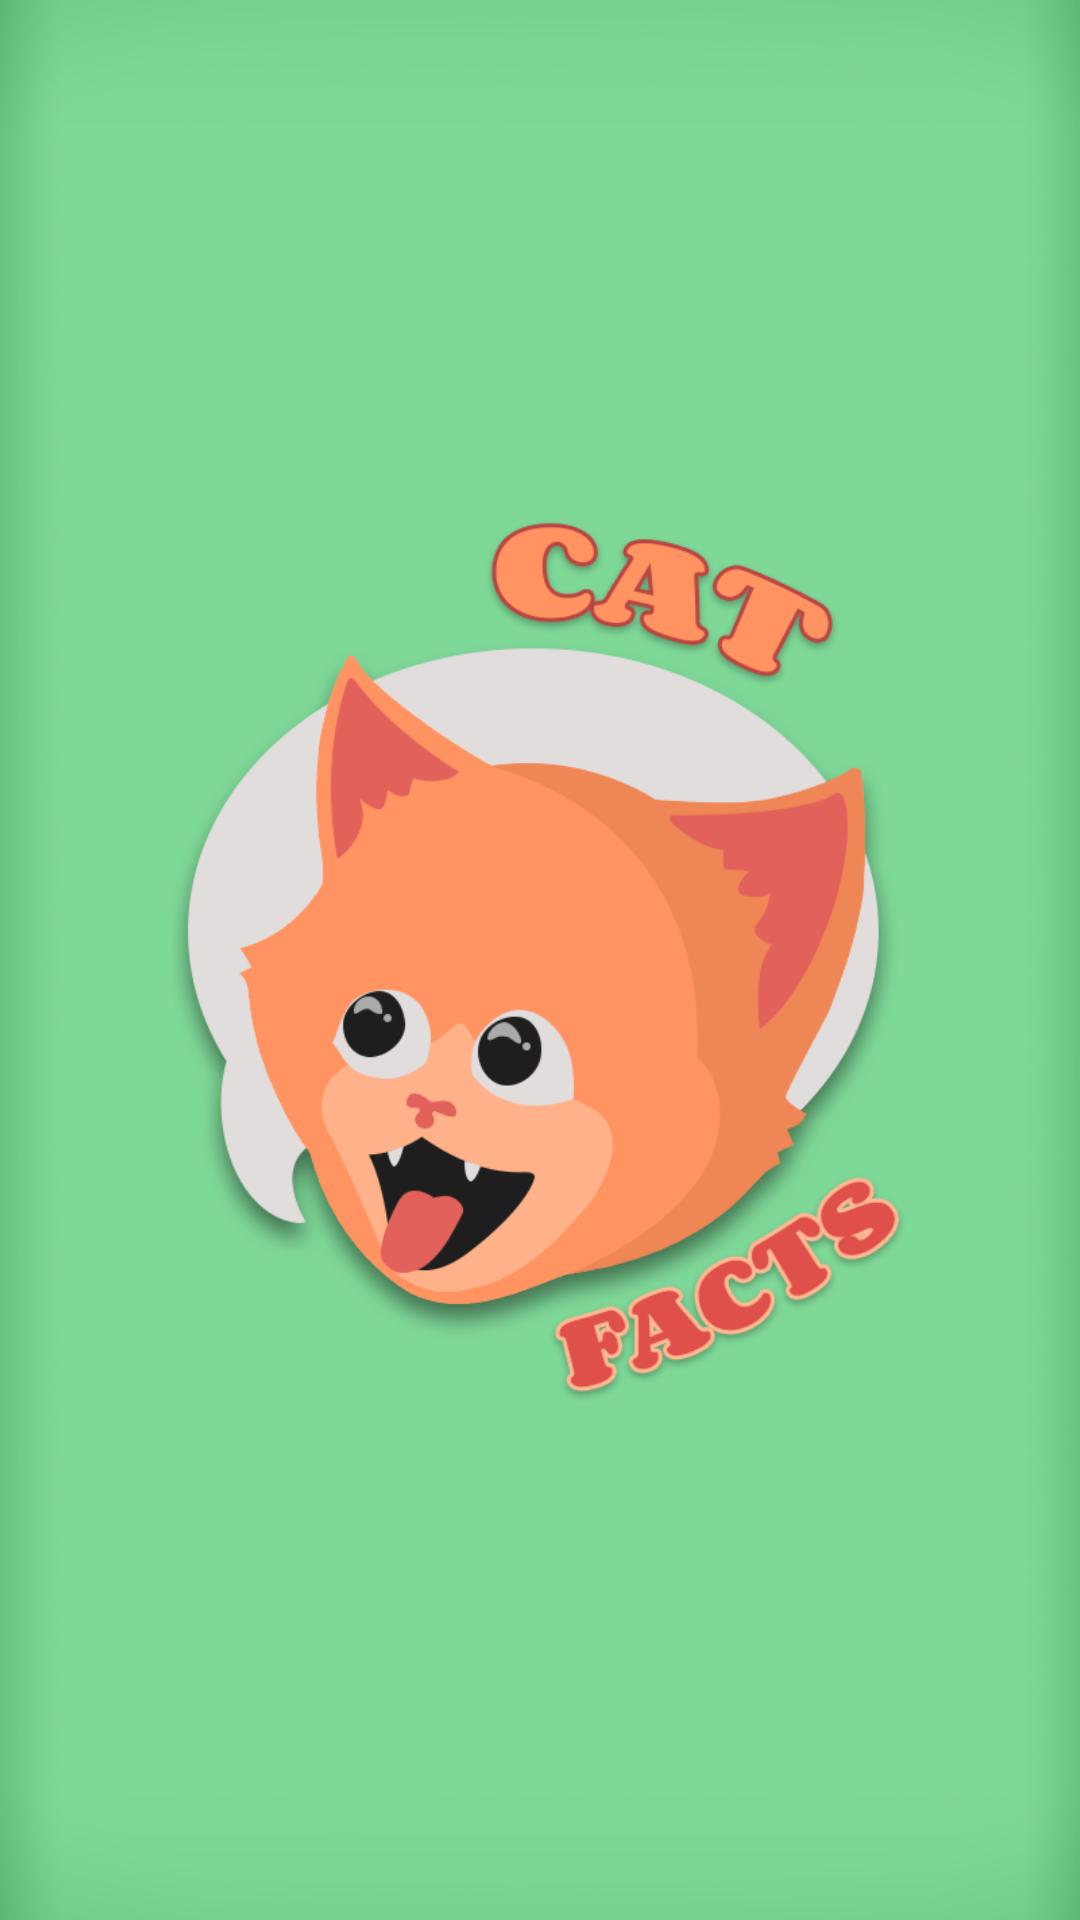 Cat Facts - Text Prank App